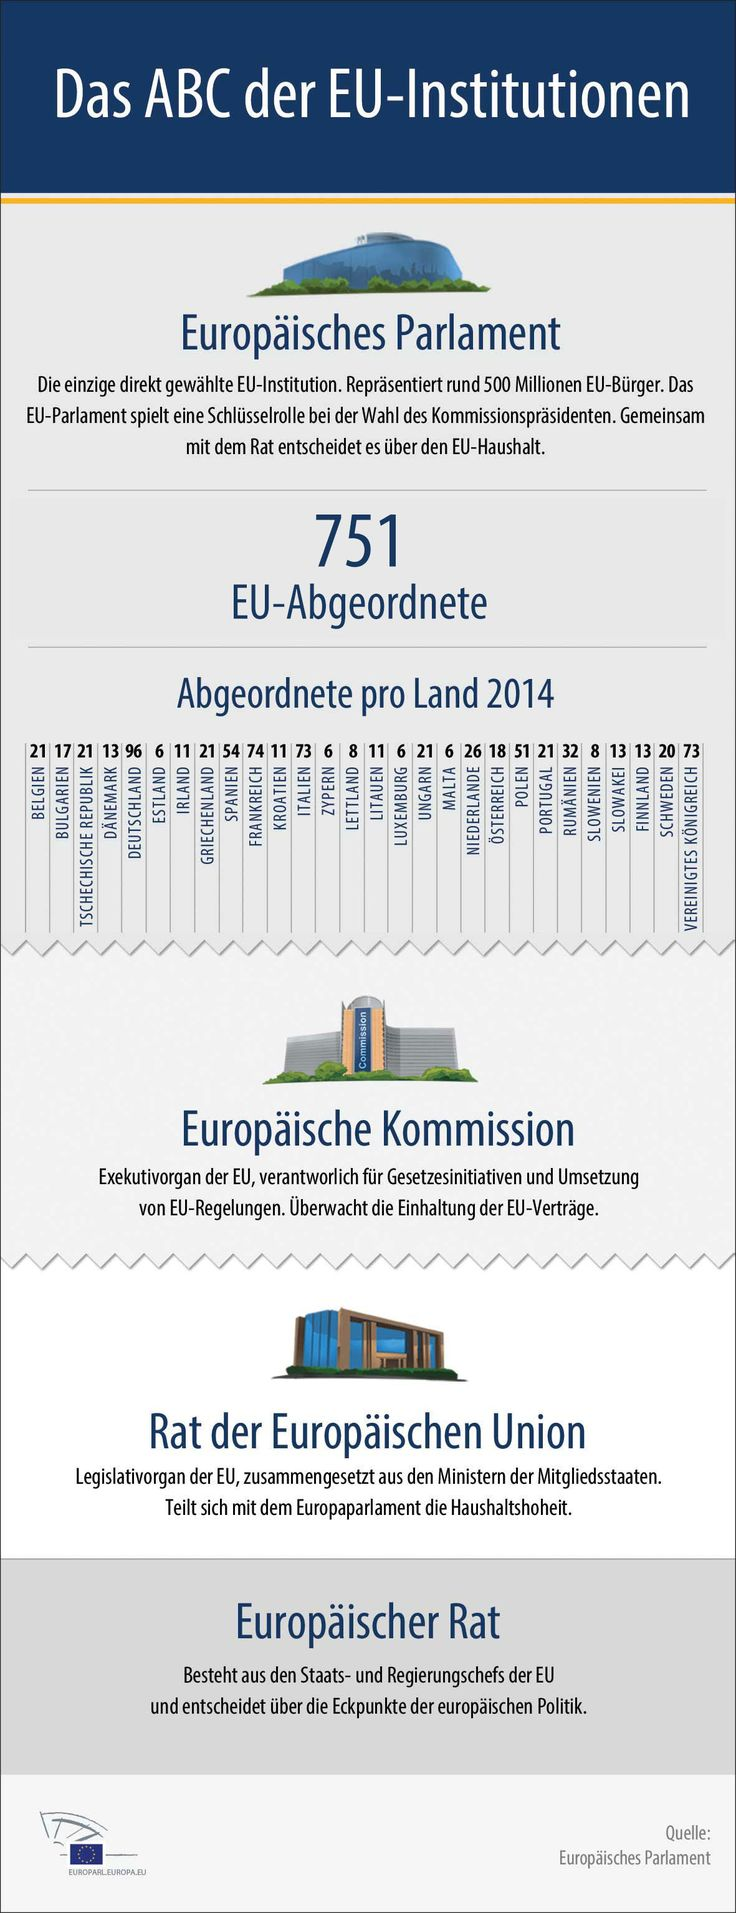 Infografik: ABC der EU-Institutionen